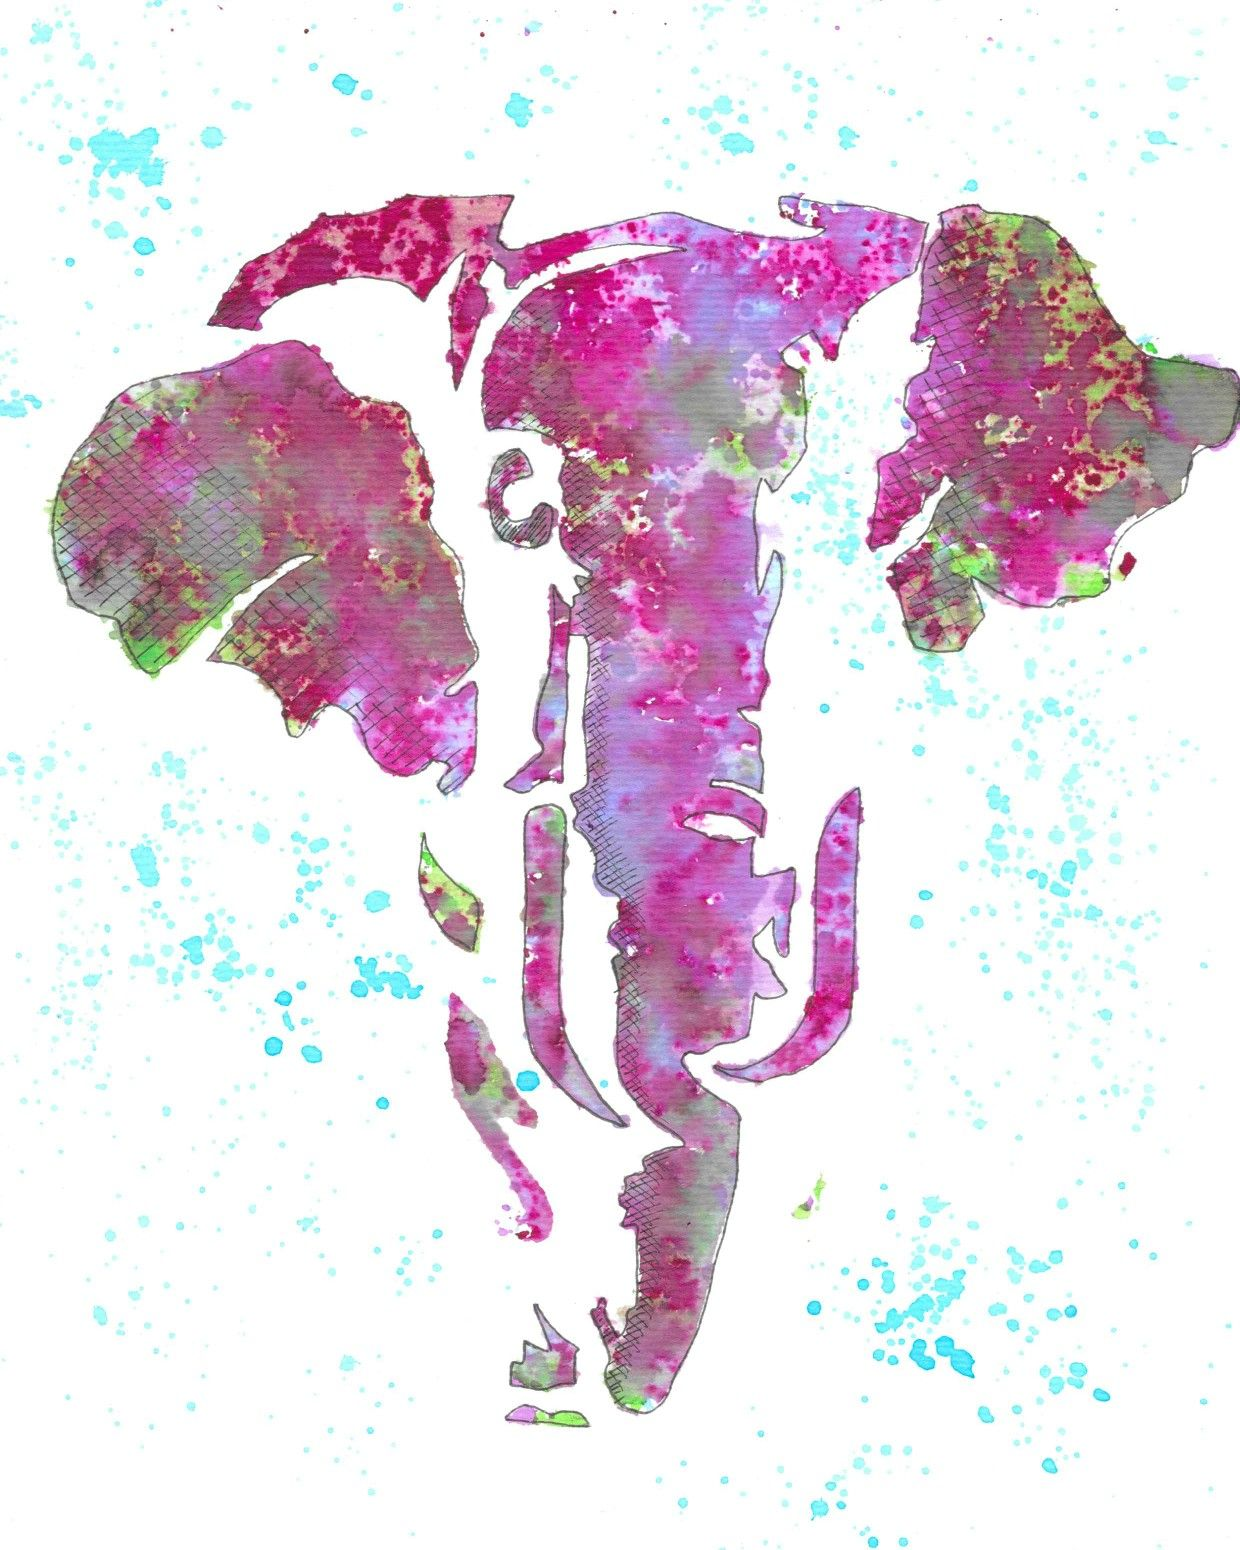 #watercolour #watercolour #watercolor #watercolorpainting #water #art #artist #artistsoninstagram #artwork #artistoninstagram #artoftheday #art #ecoline #aquarellepainting #aquarelle #draweveryday #drawingoftheday #drawdrawdraw #drawingsketch #drawings #drawing #drawingdaily #drawingsofinstagram #drawingchallenge